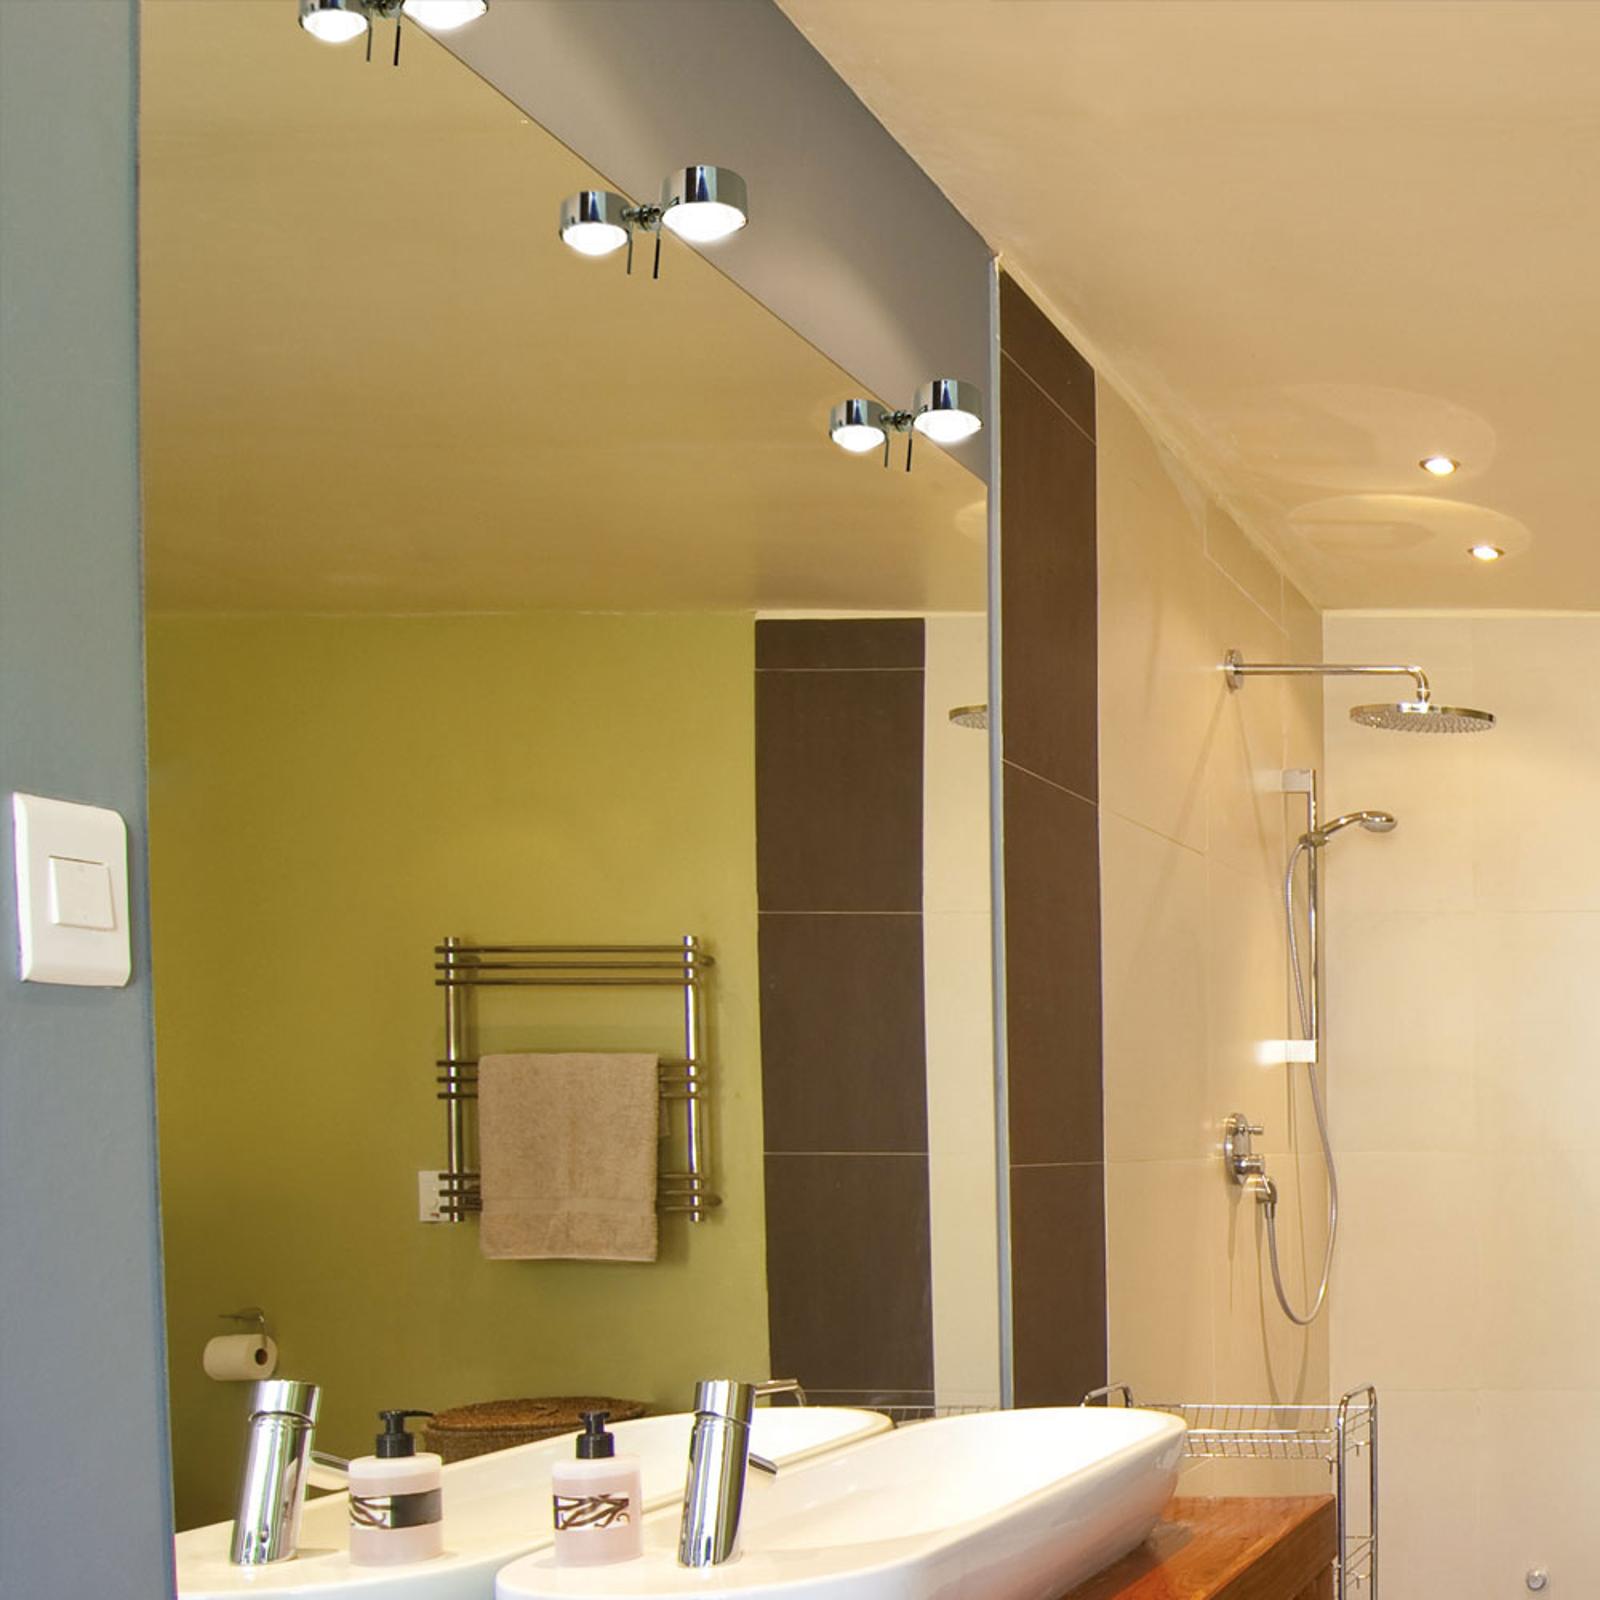 Acquista Lampada LED pinza specchio Puk Fix+